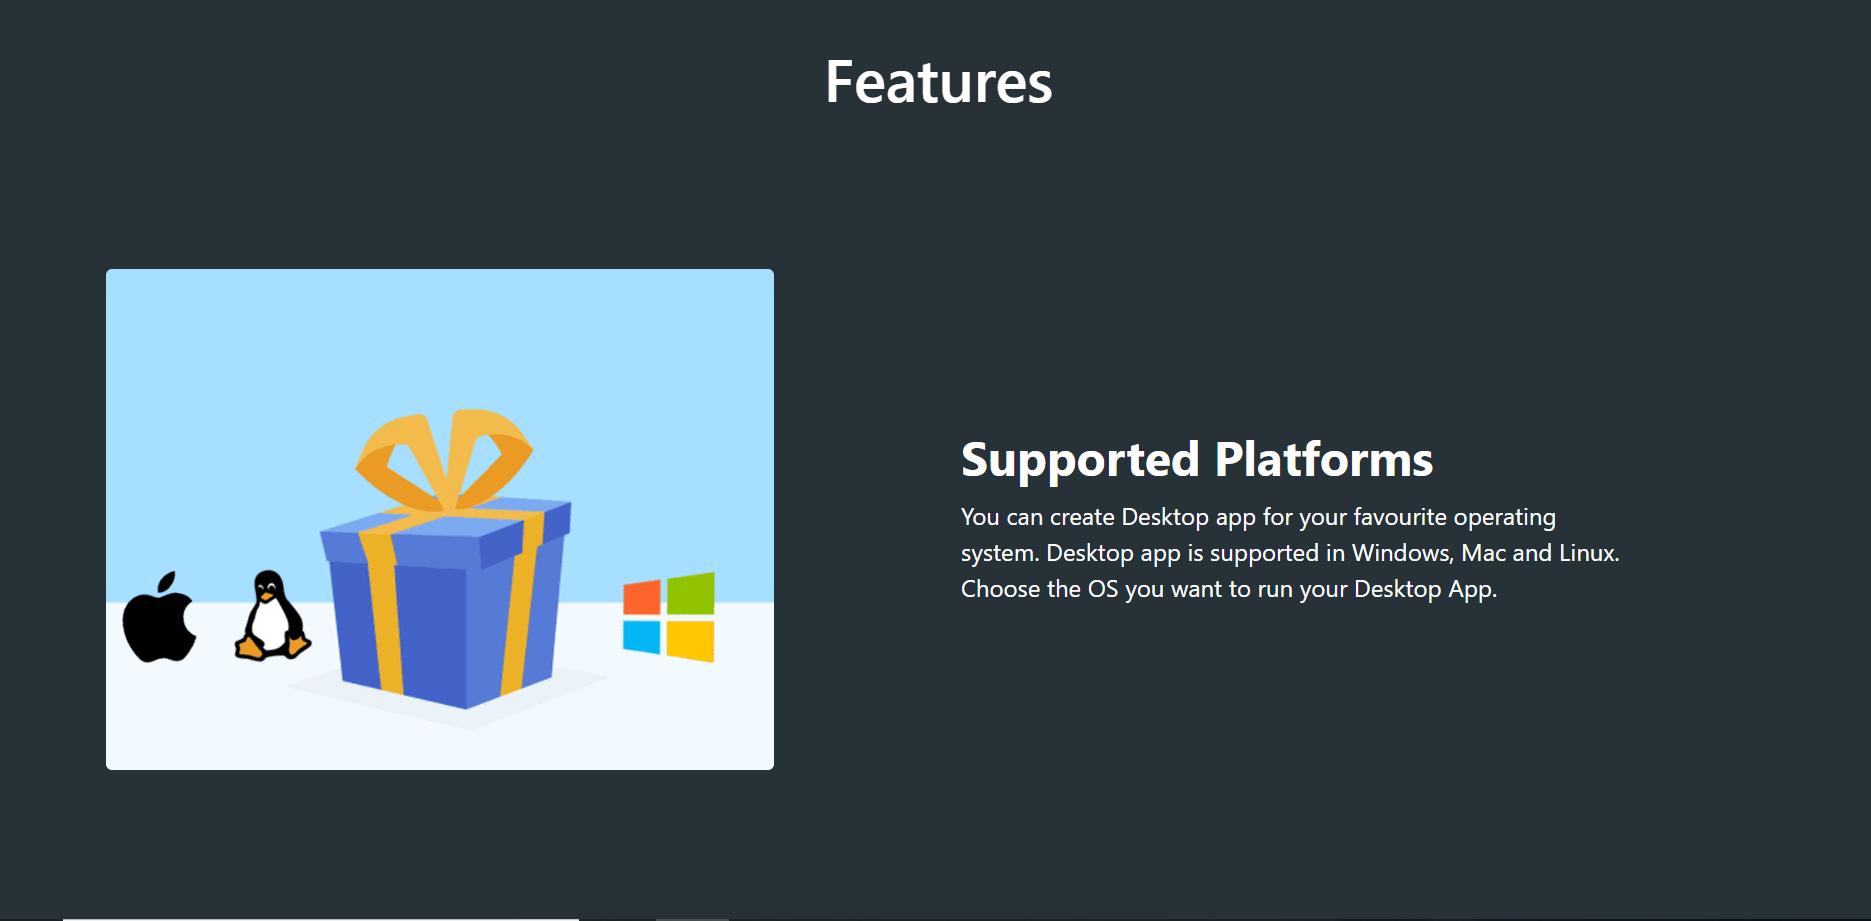 Windows Linux and mac desktop app get